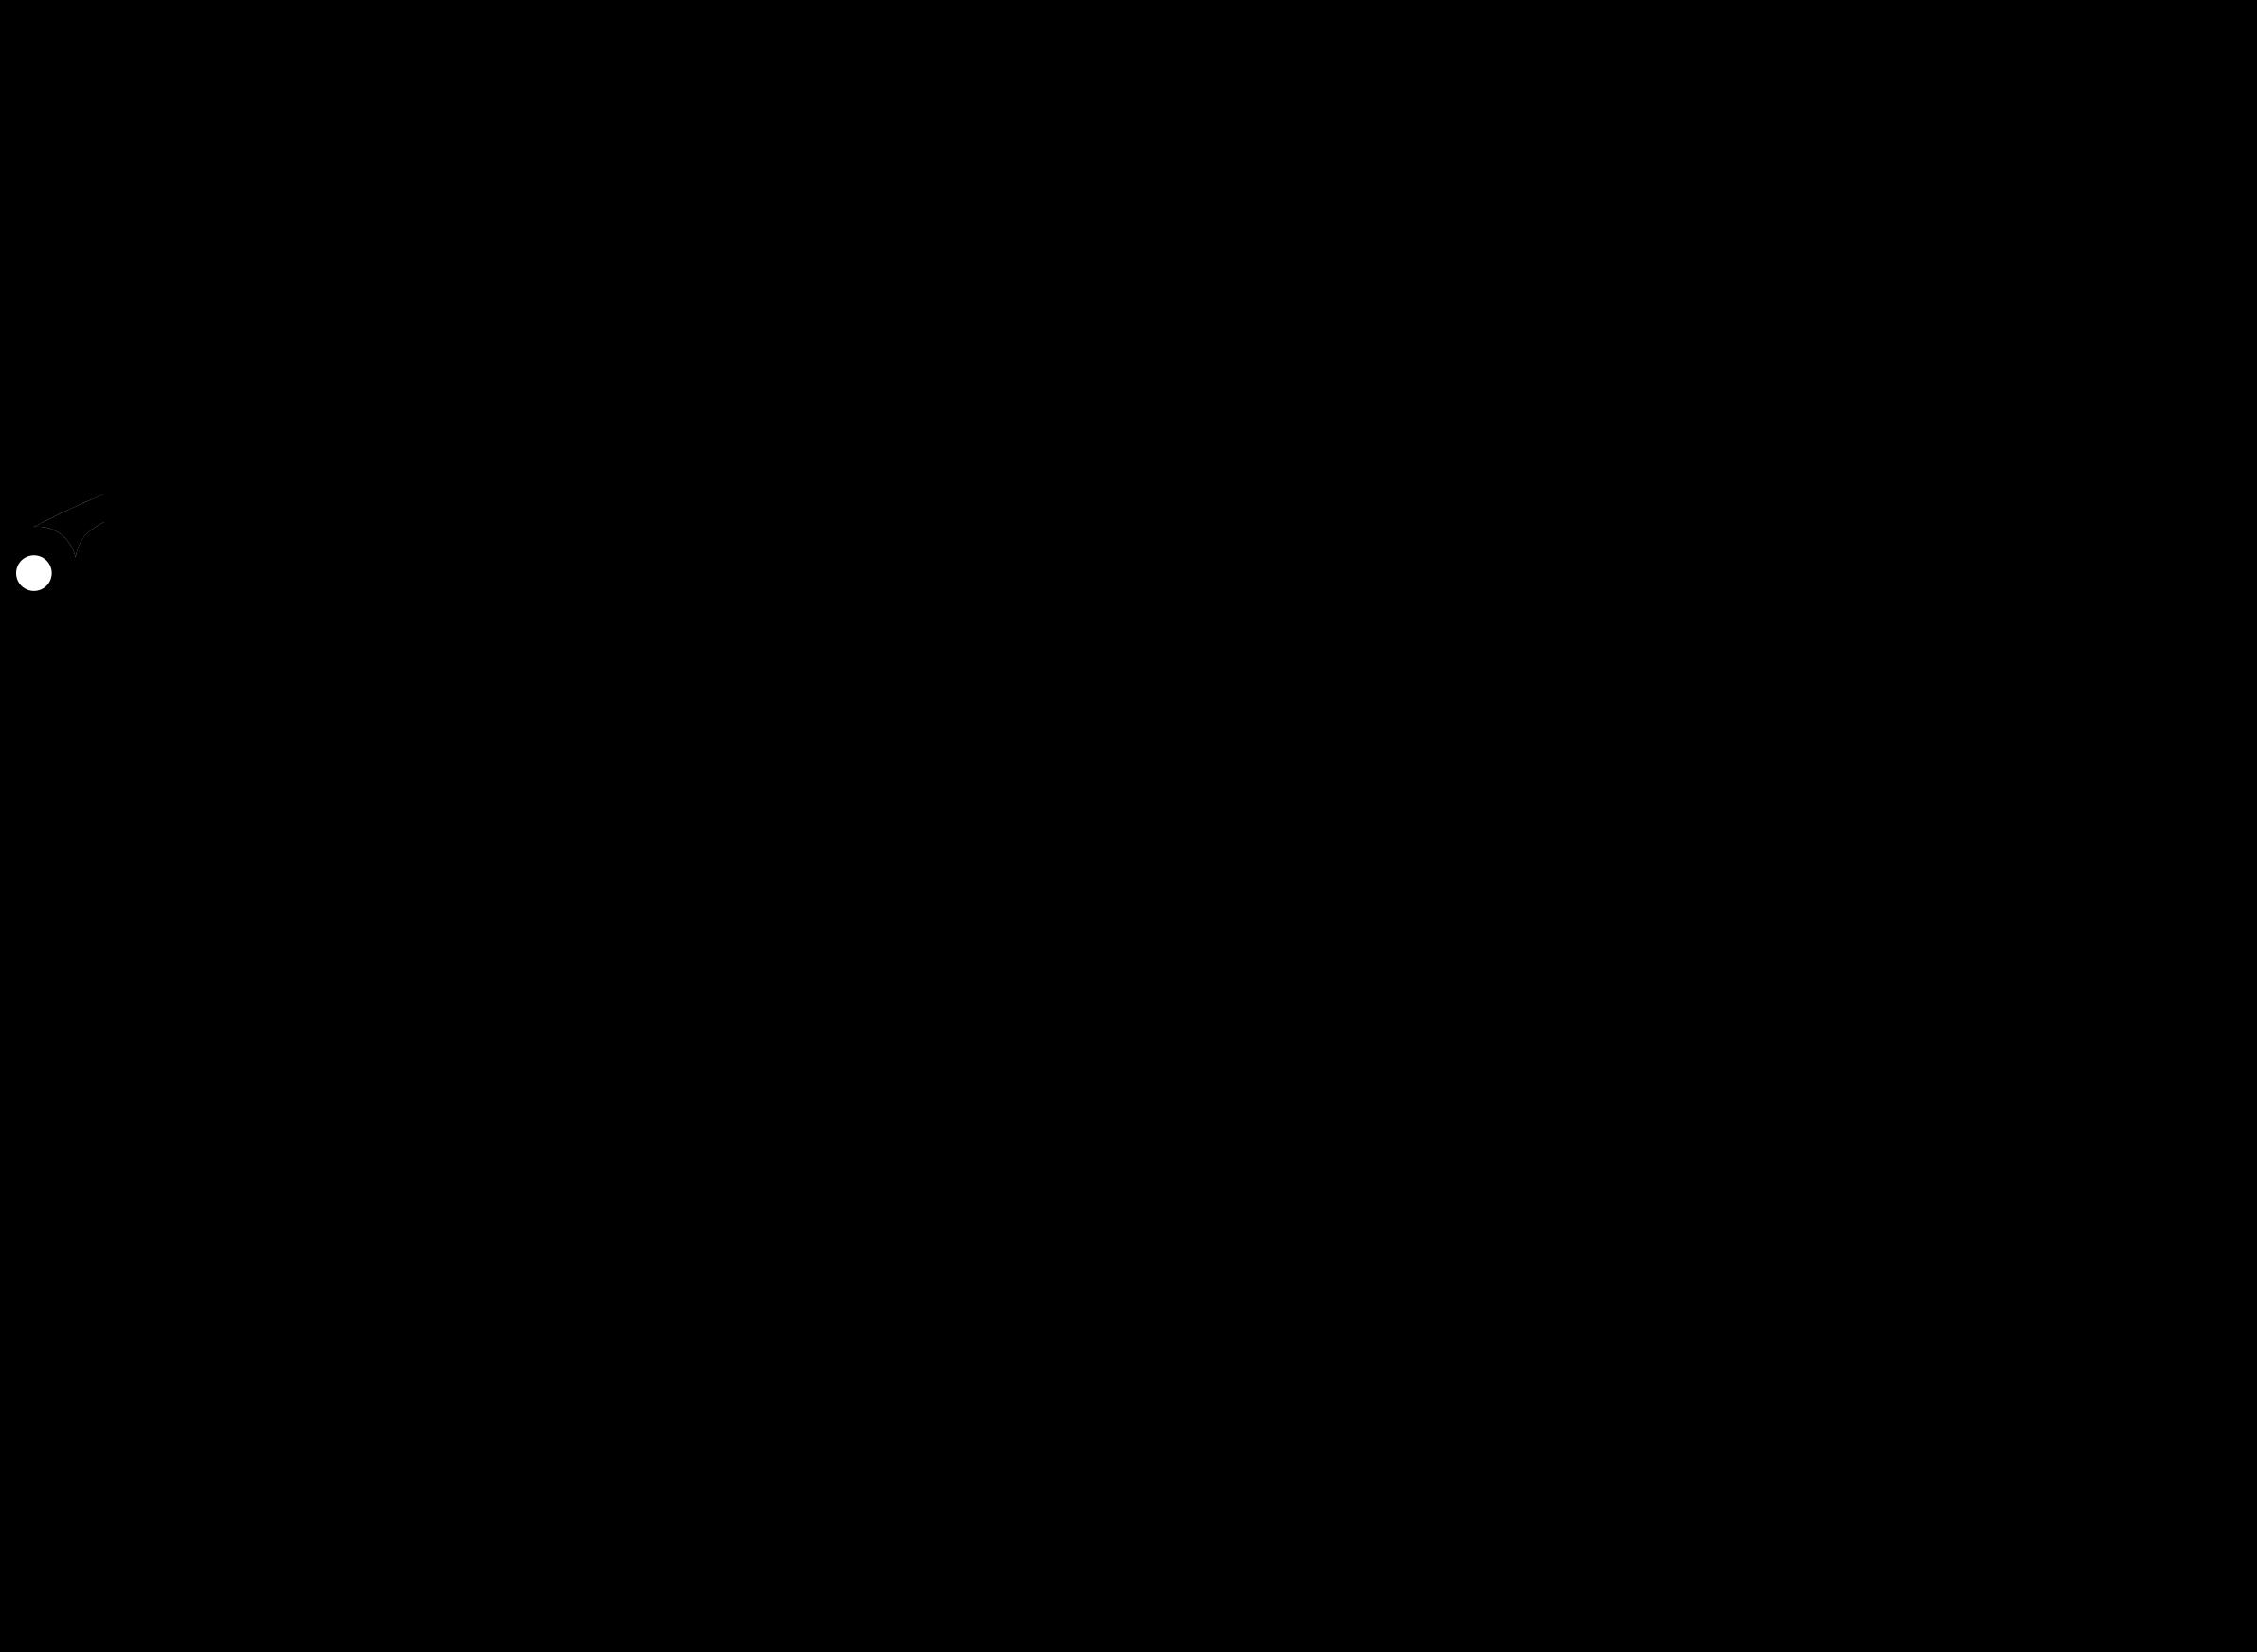 Silai Machine Png Images Free Download Free Transparent Png Logos